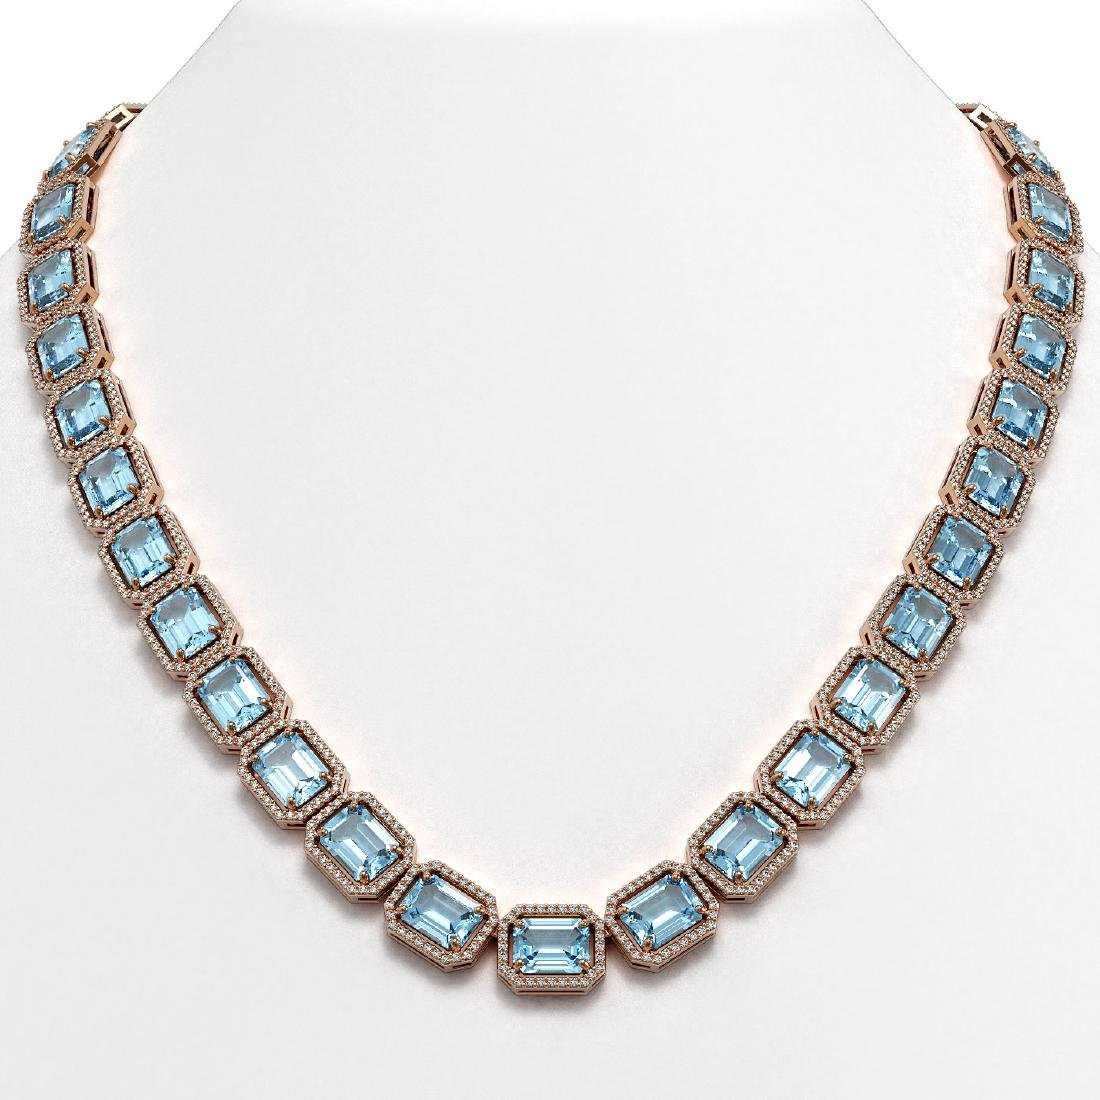 78.34 CTW Sky Topaz & Diamond Halo Necklace 10K Rose